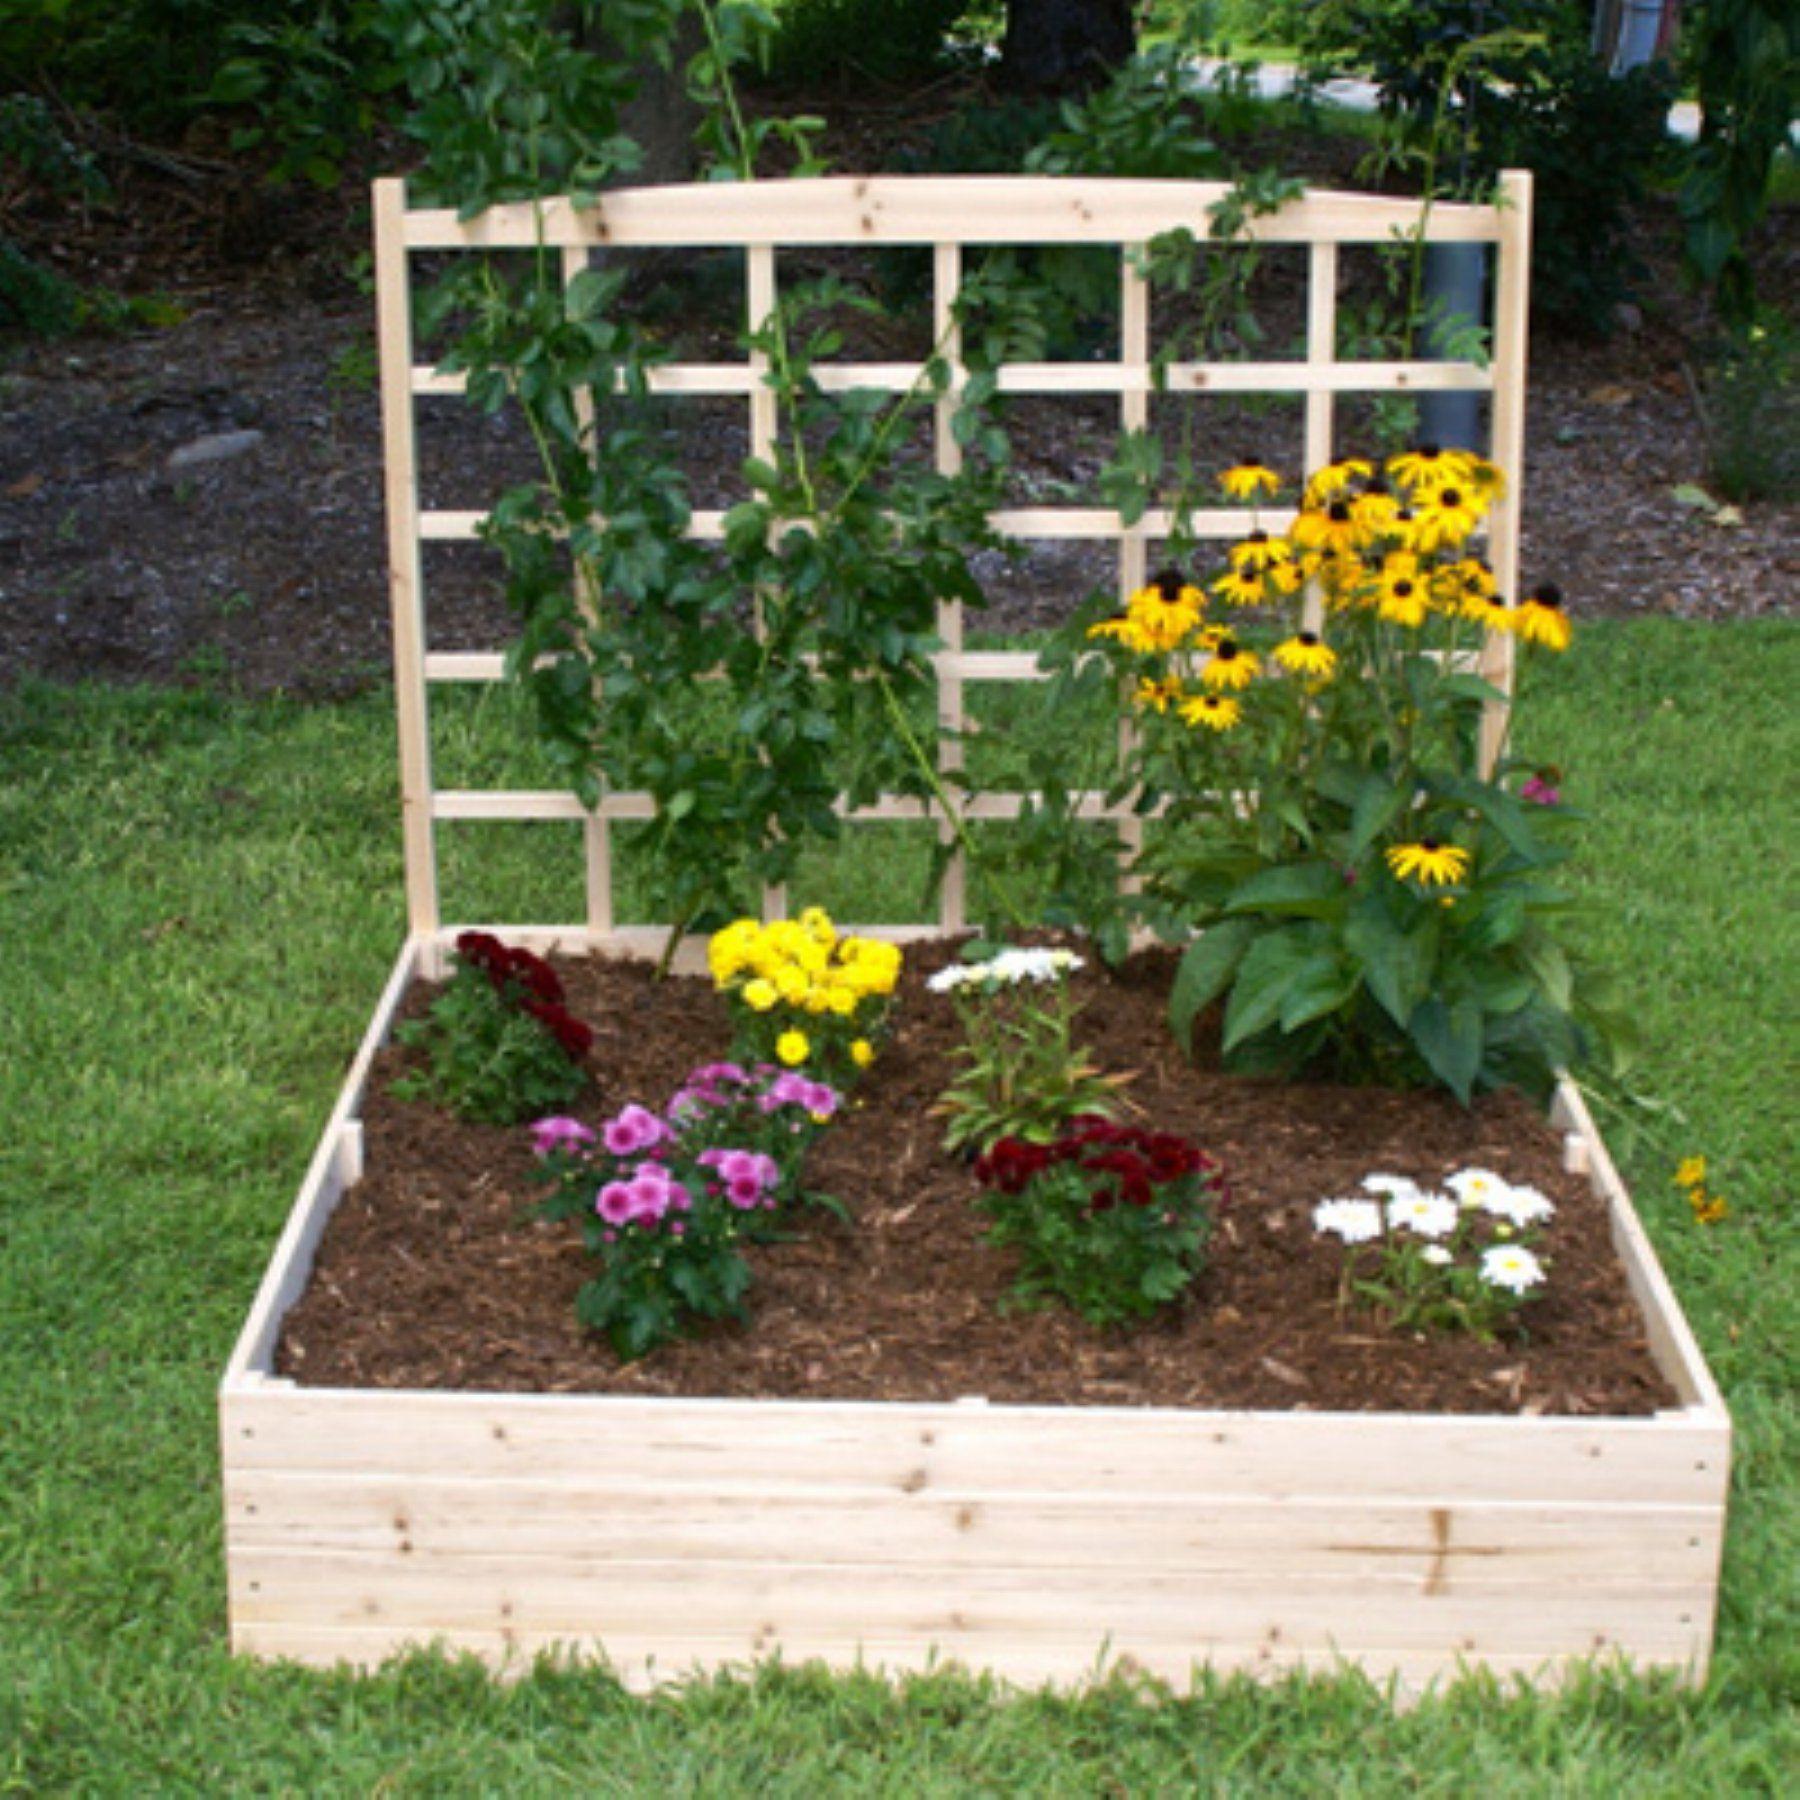 Eden Raised Garden Bed With Trellis 4 X 4 Ft 640 x 480